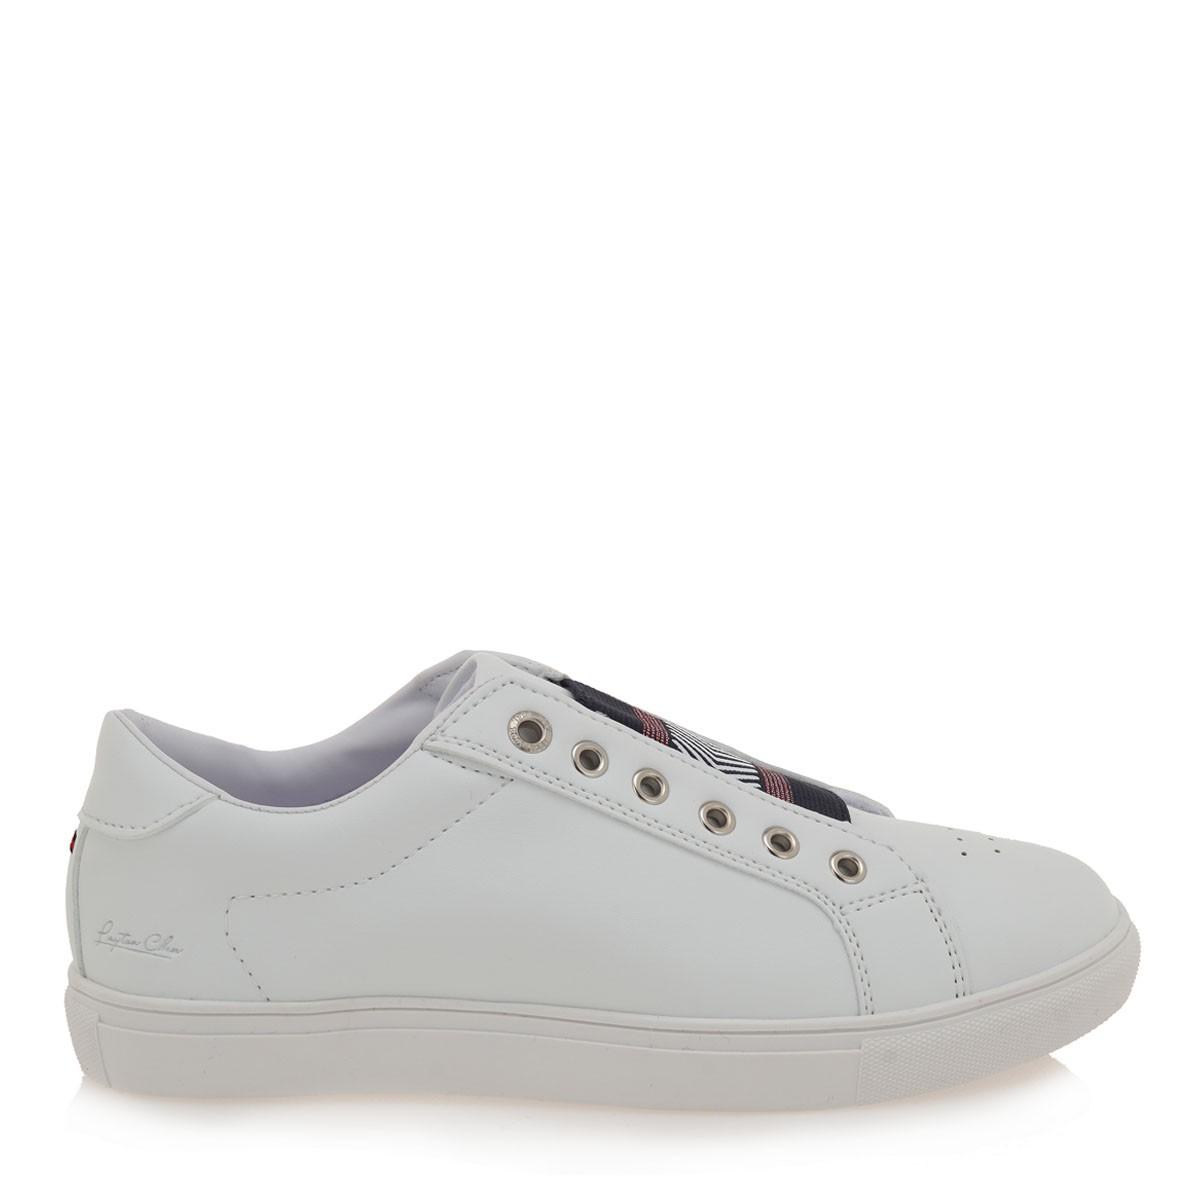 61be68eccf Exe Shoes Sneakers Γυναικεία Παπούτσια 003 Λευκό I157Q0031651 – IShoeStore